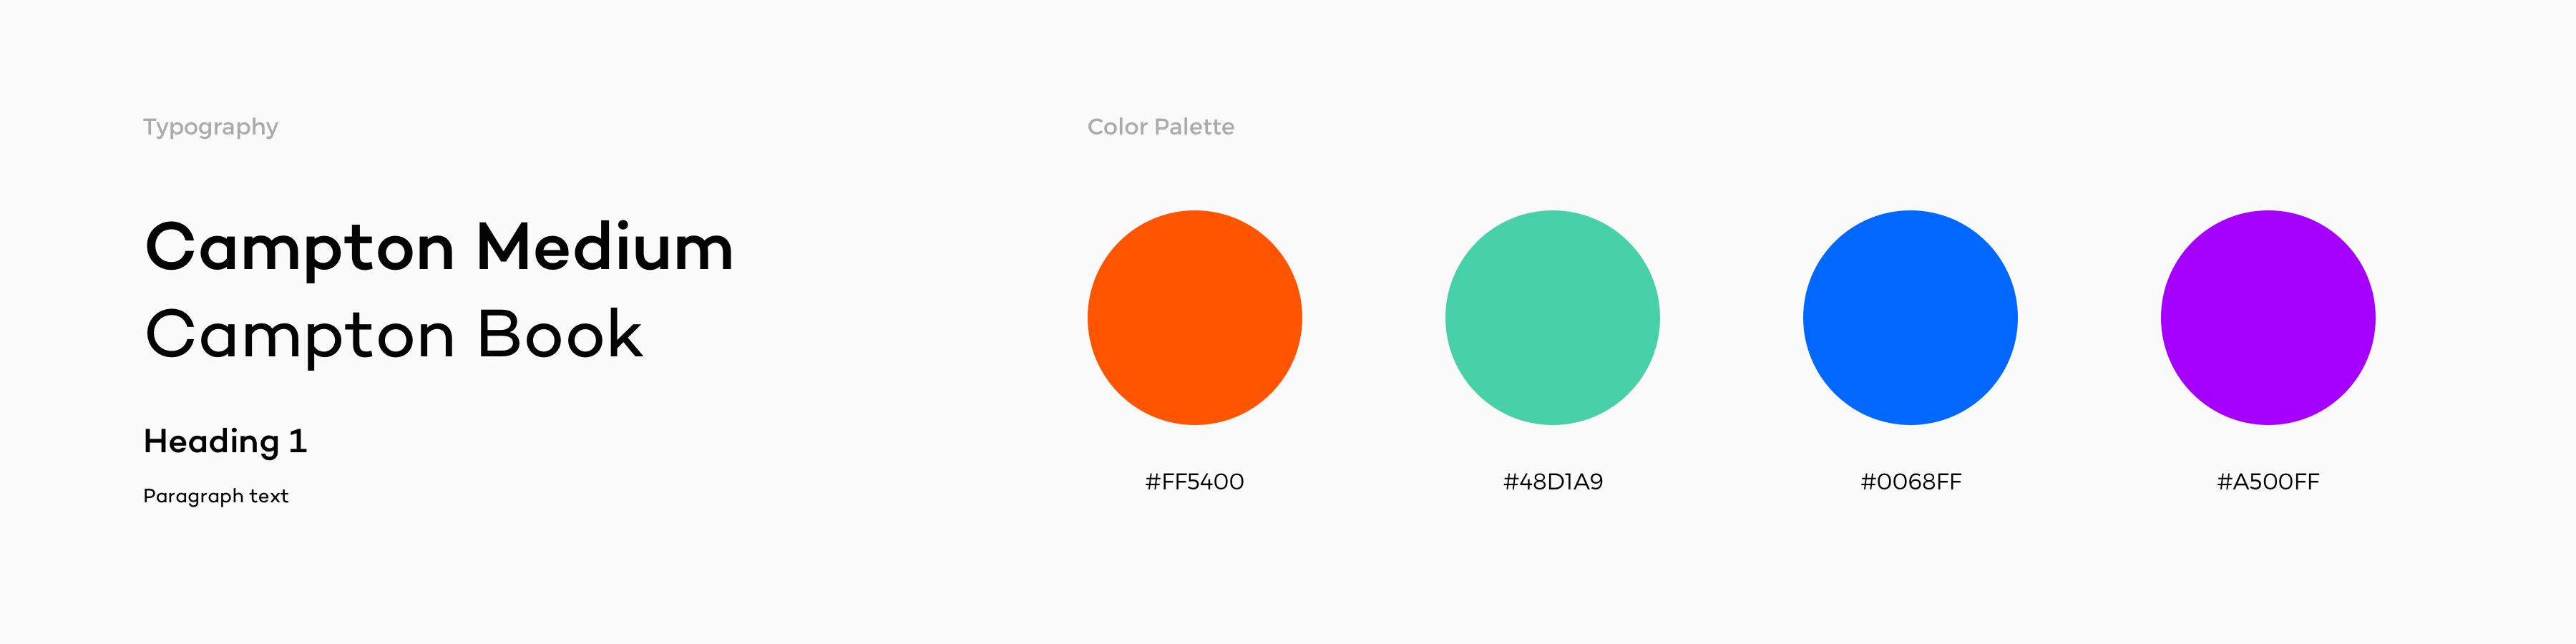 coroflot-redesign-palette-typography